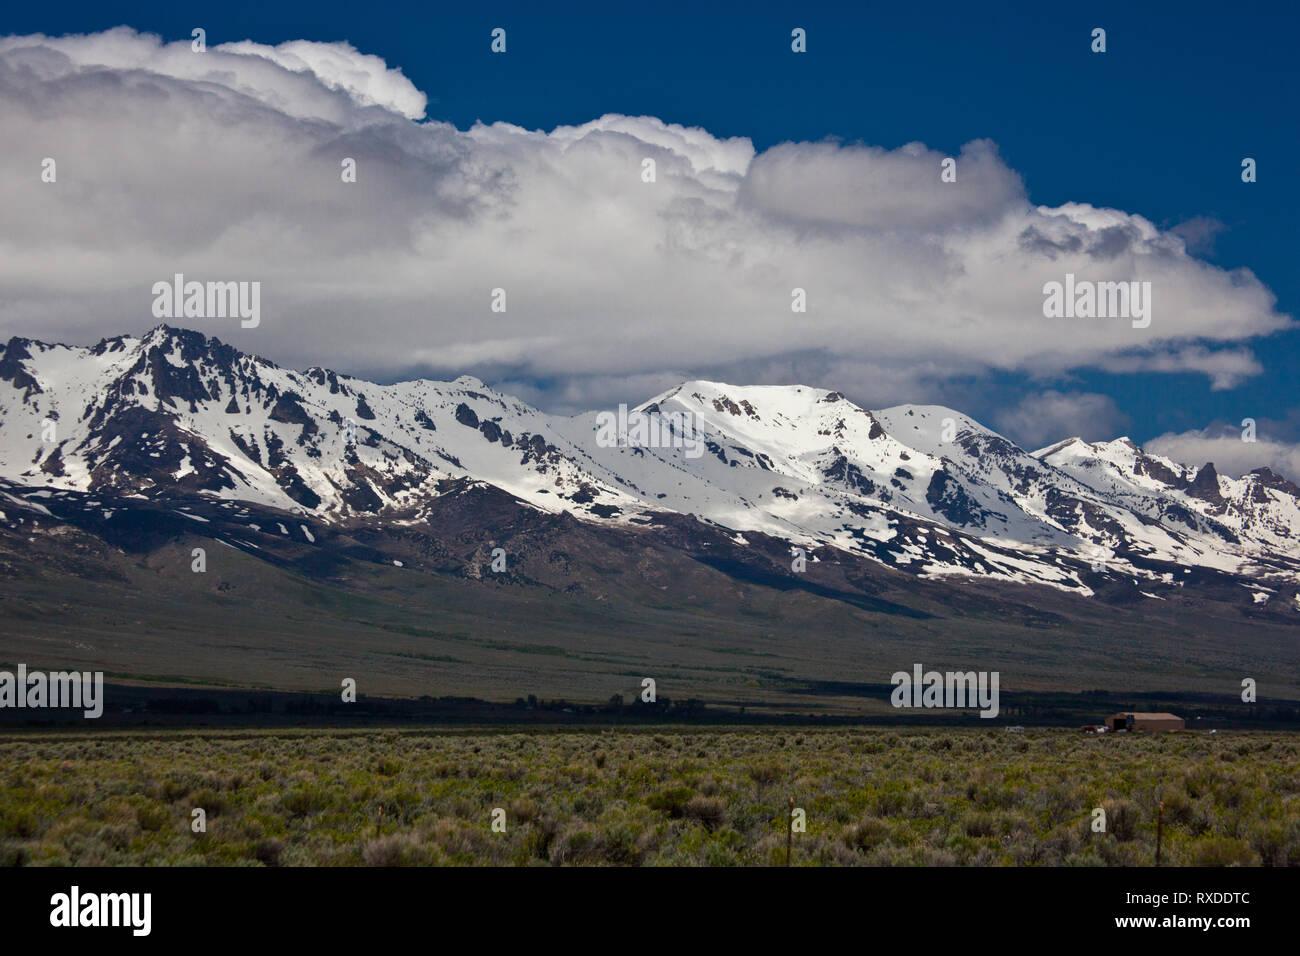 Ruby Mountains, Elko County, Nevada, USA - Stock Image